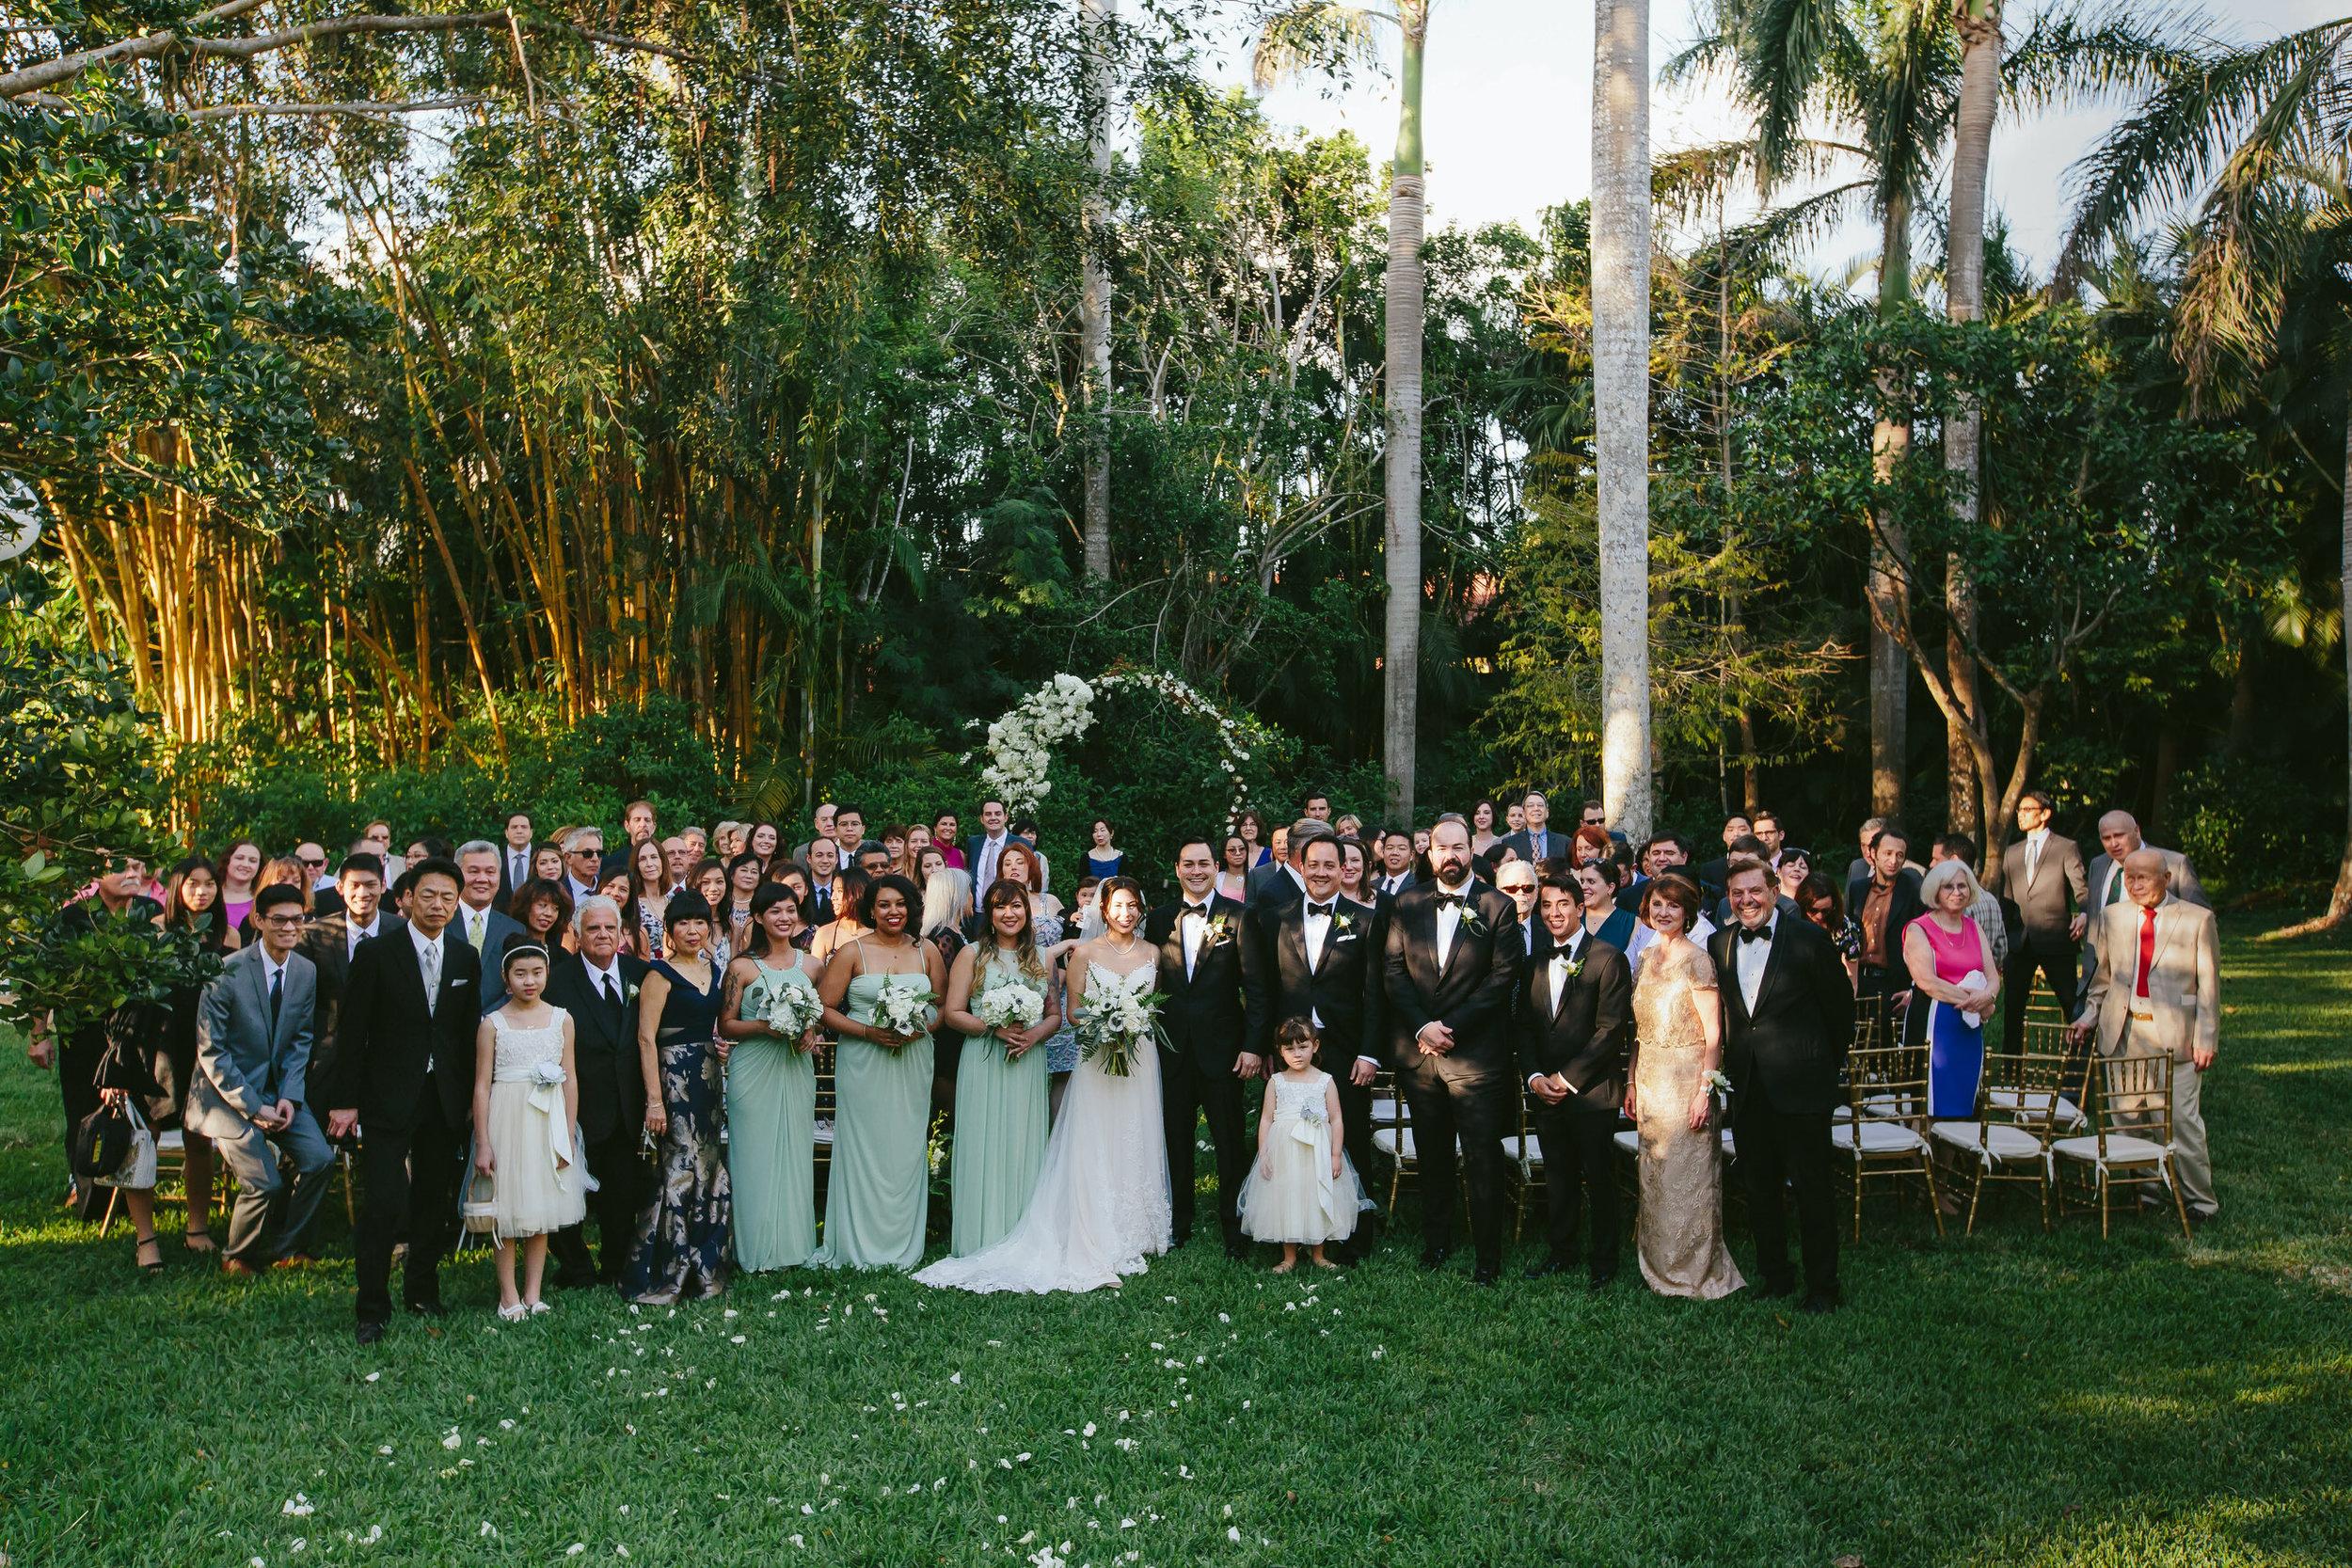 wedding_guests_portrait_ceremony_tiny_house_photo_backyard_rustic_wedding.jpg